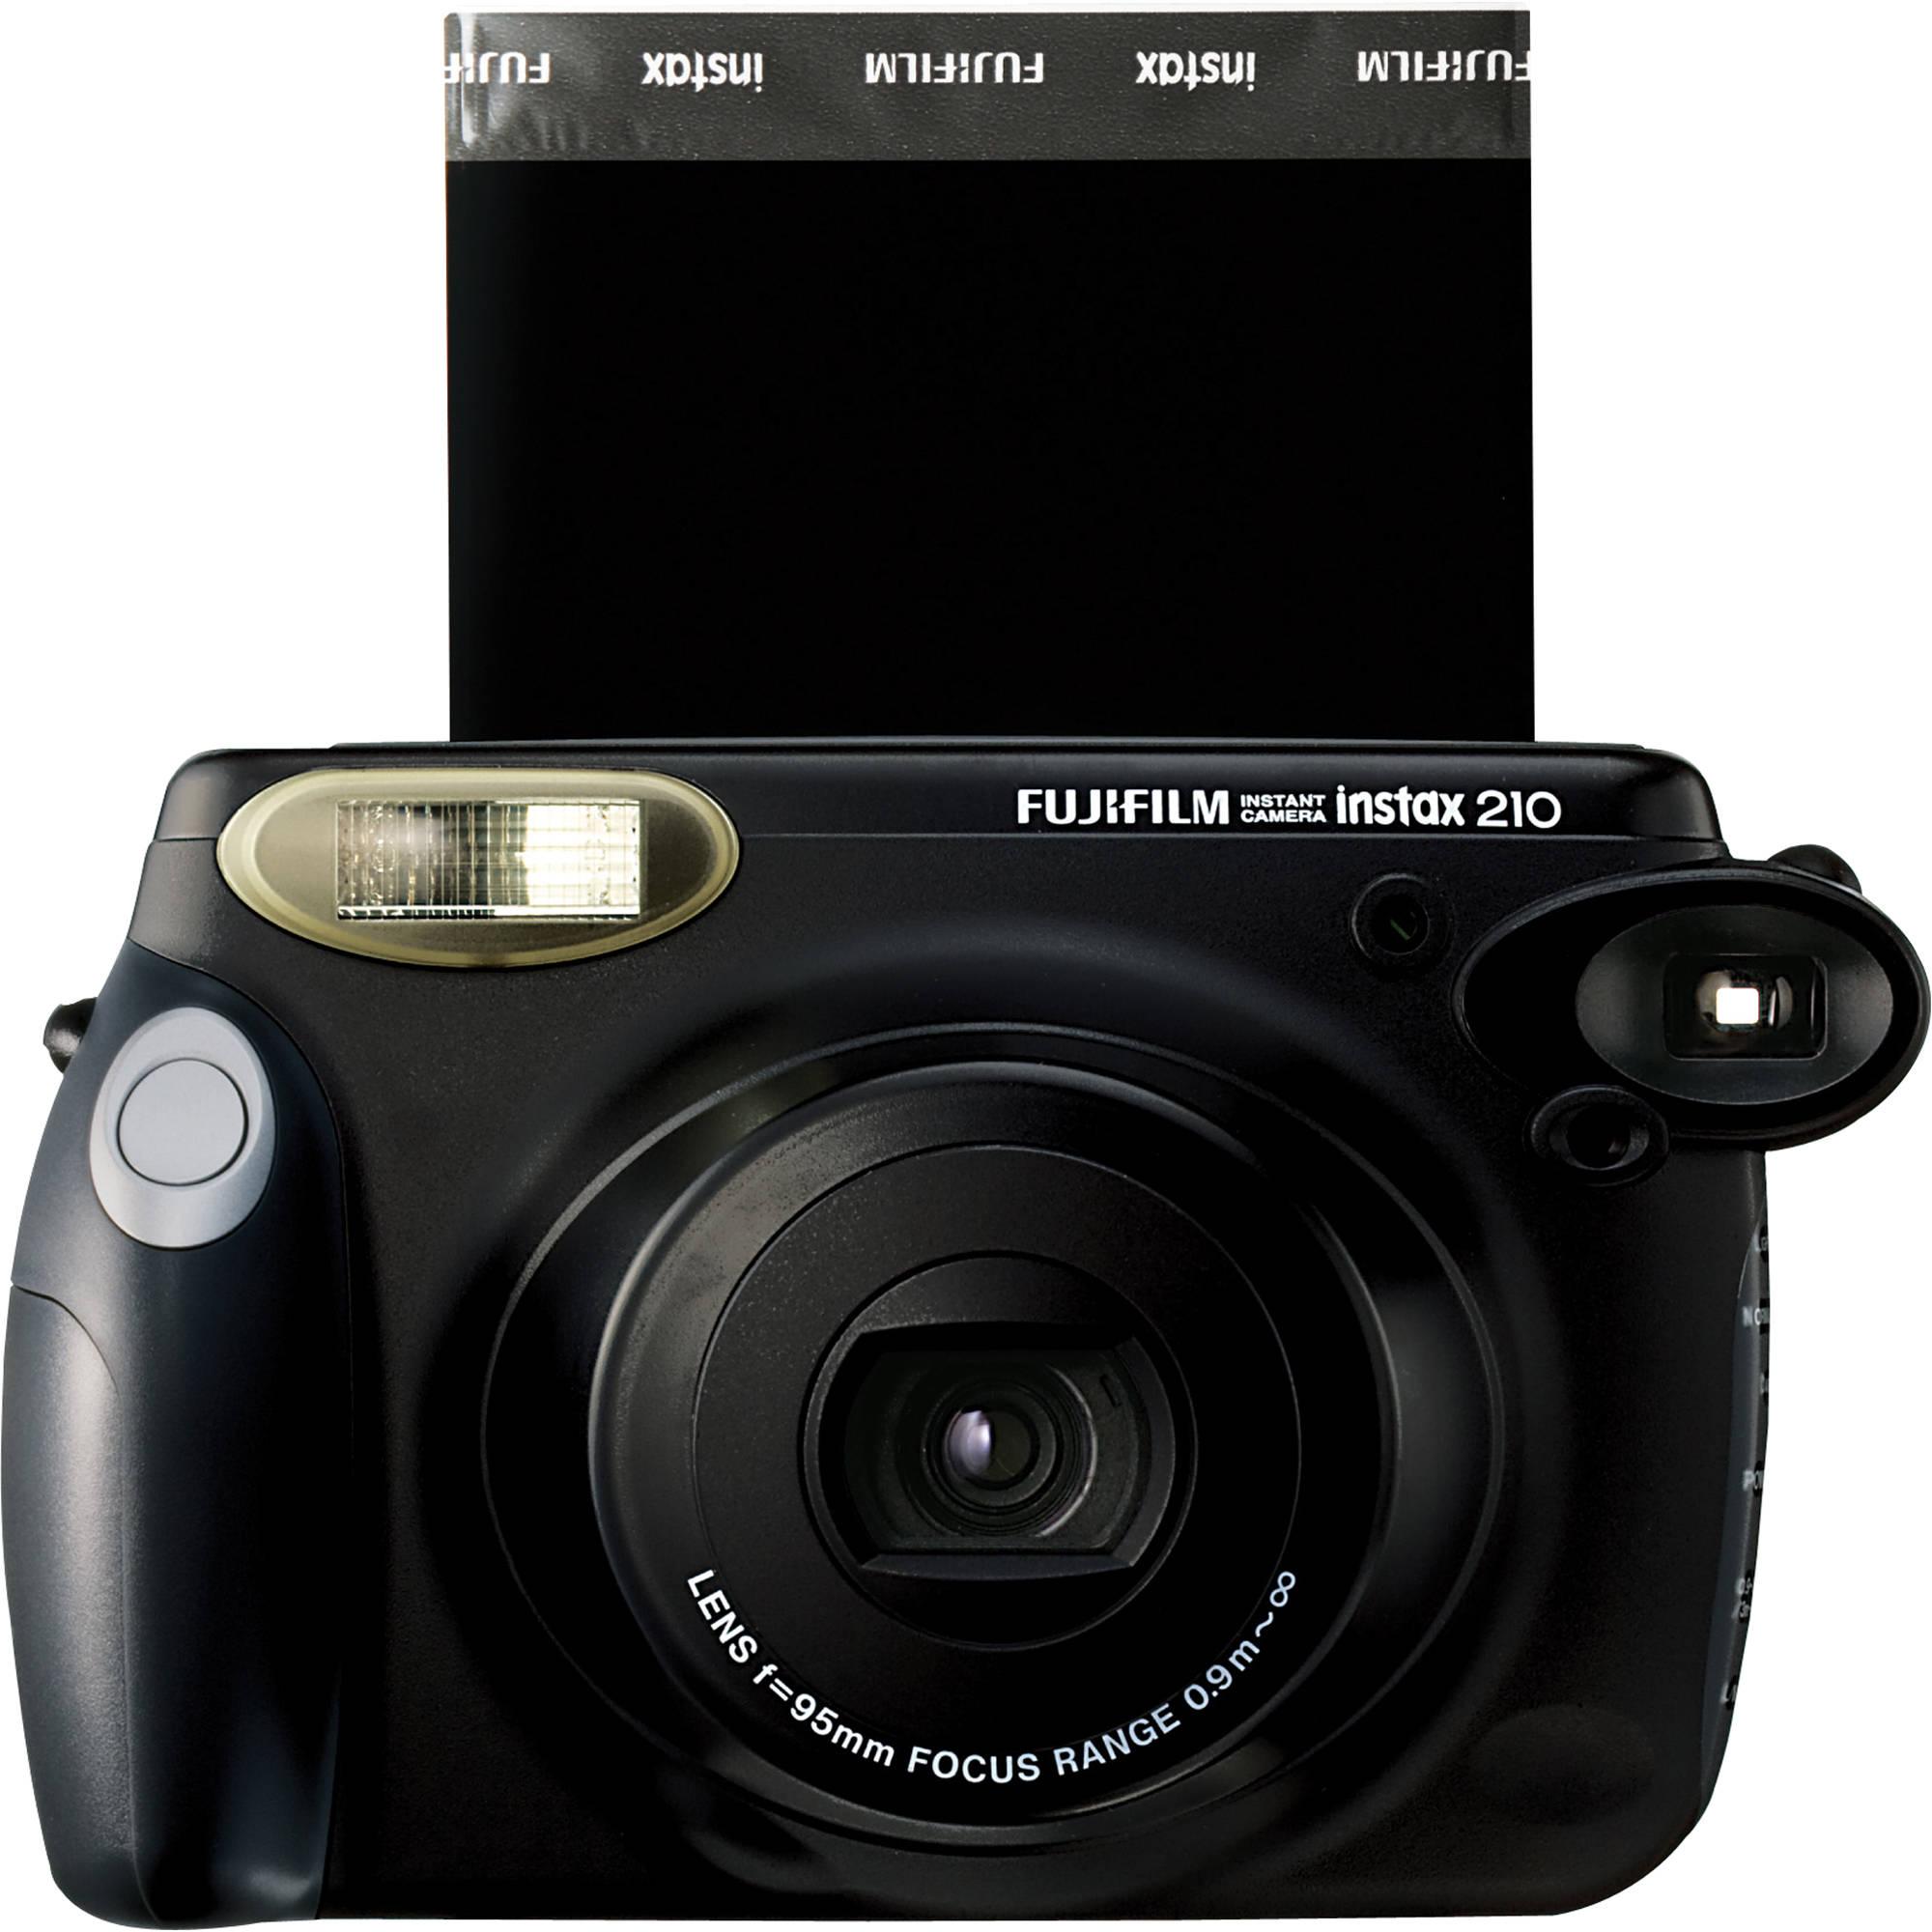 Fuji Camera: Fujifilm Instax 210 Instant Film Camera 15950793 B&H Photo